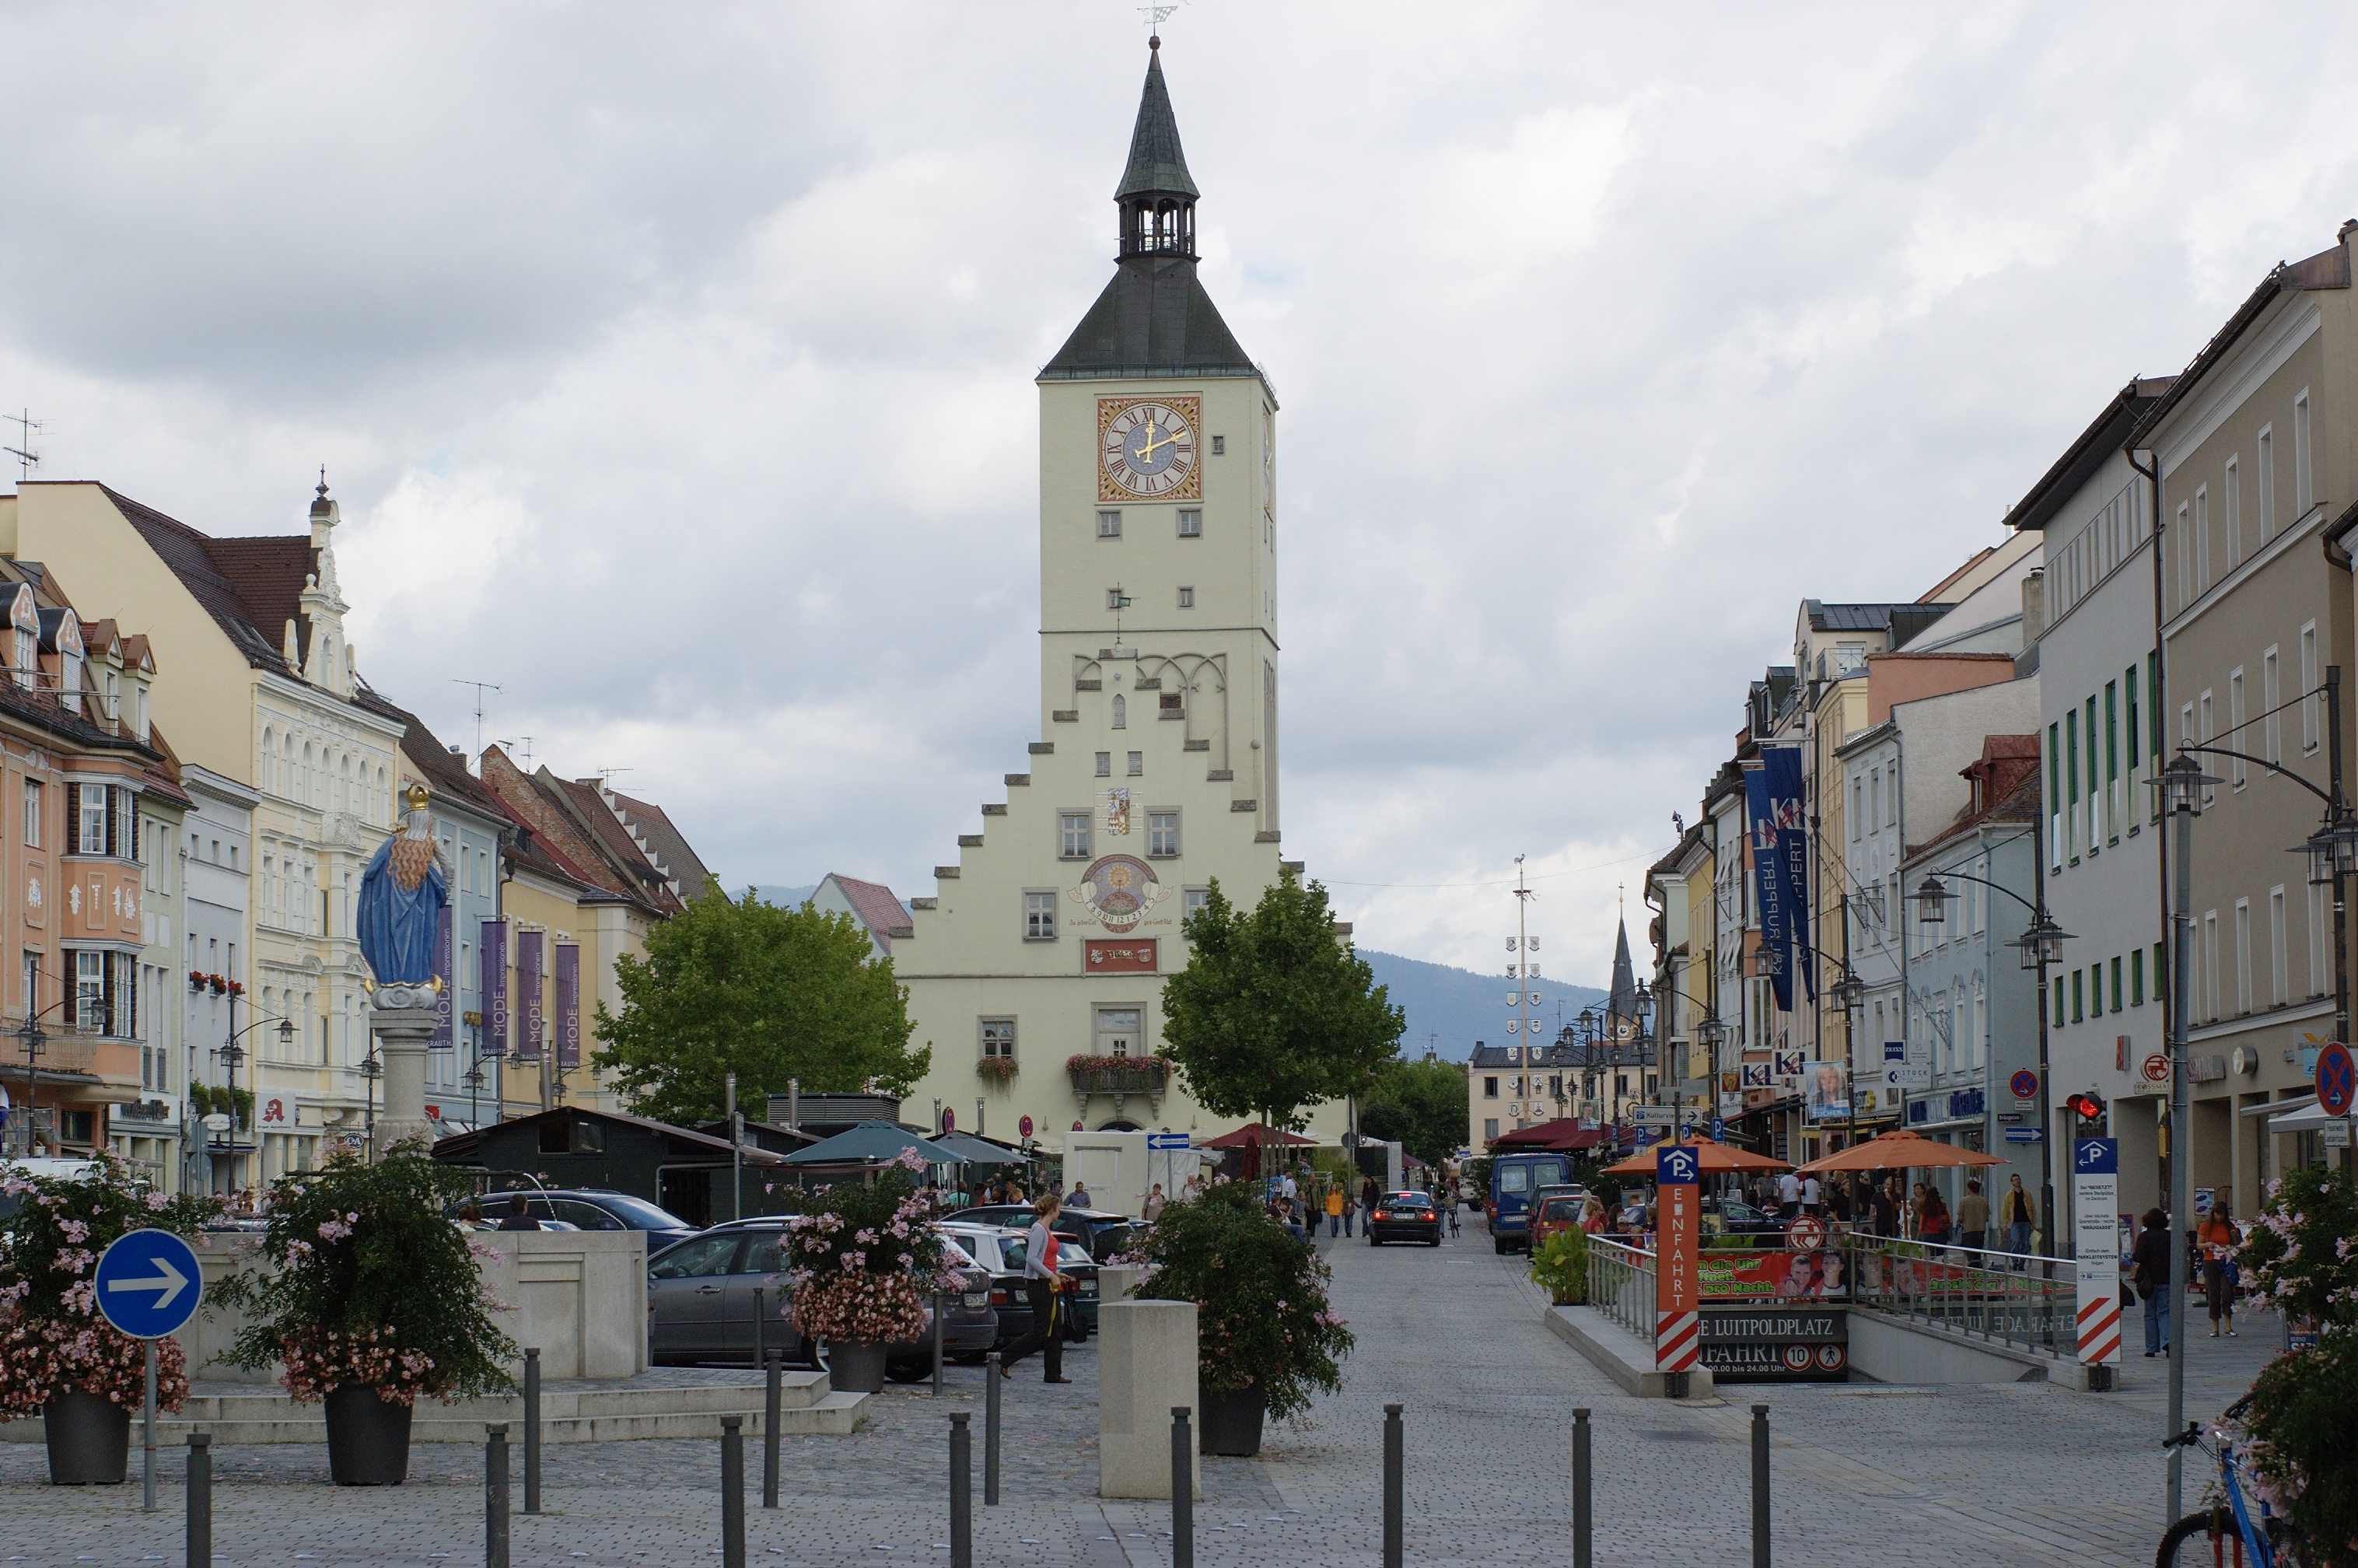 File:City center of Deggendorf, Bavaria.jpg - Wikimedia